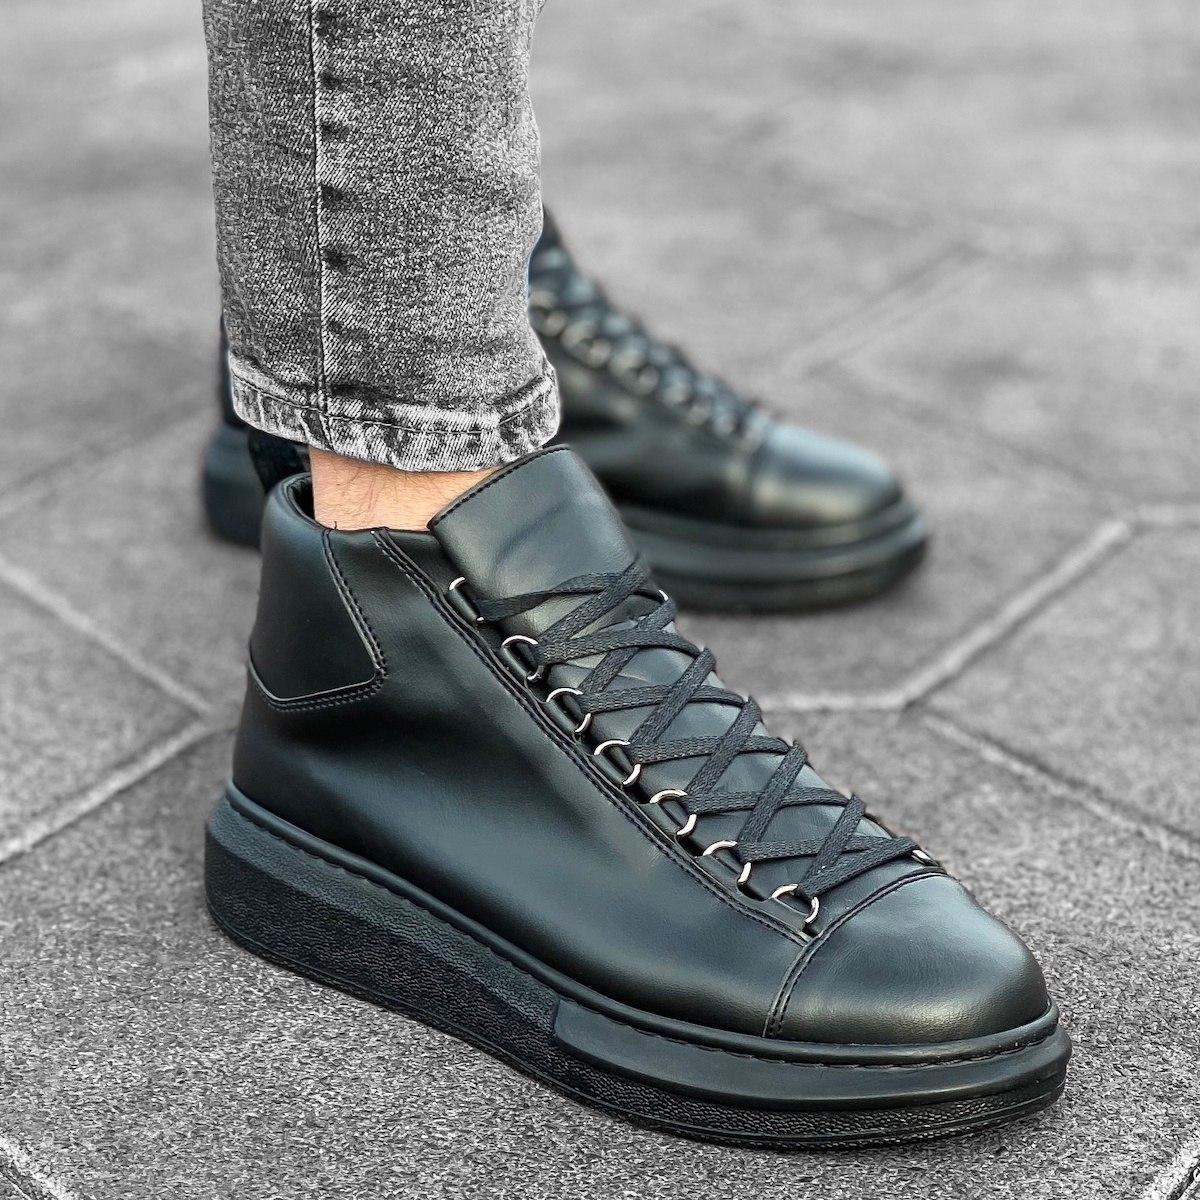 Men's High Top Sneakers Shoes Black